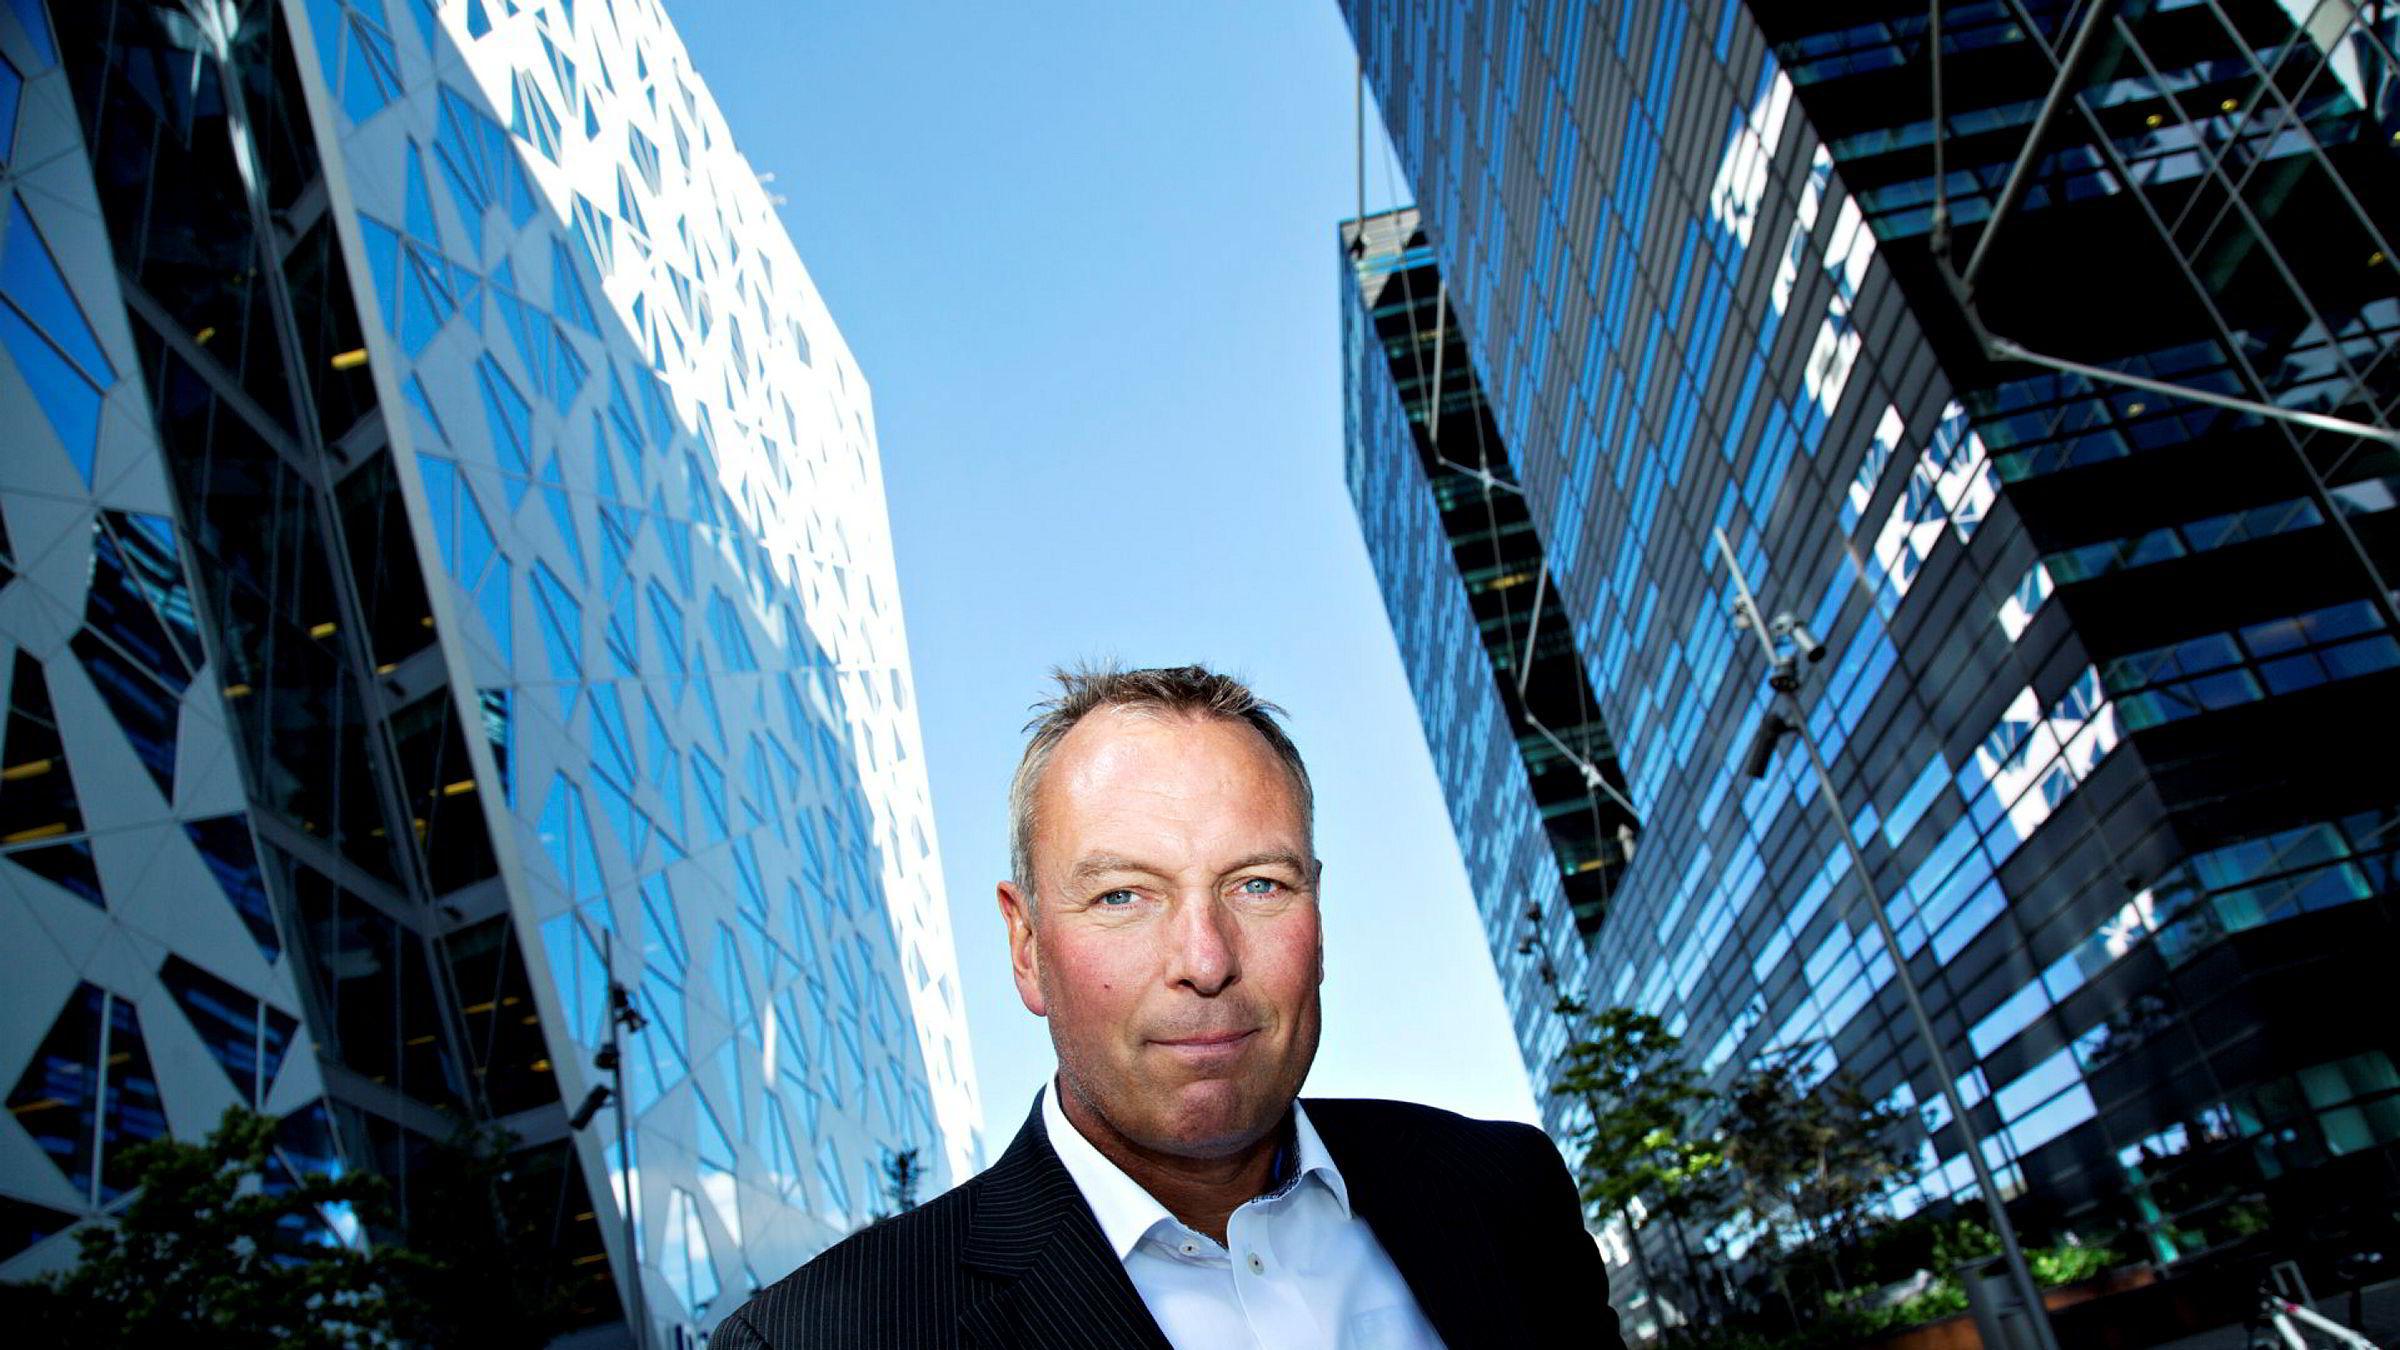 Administrerende direktør Rolf Thorsen i Selvaag Bolig er fornøyd med gode resultater i 2019.